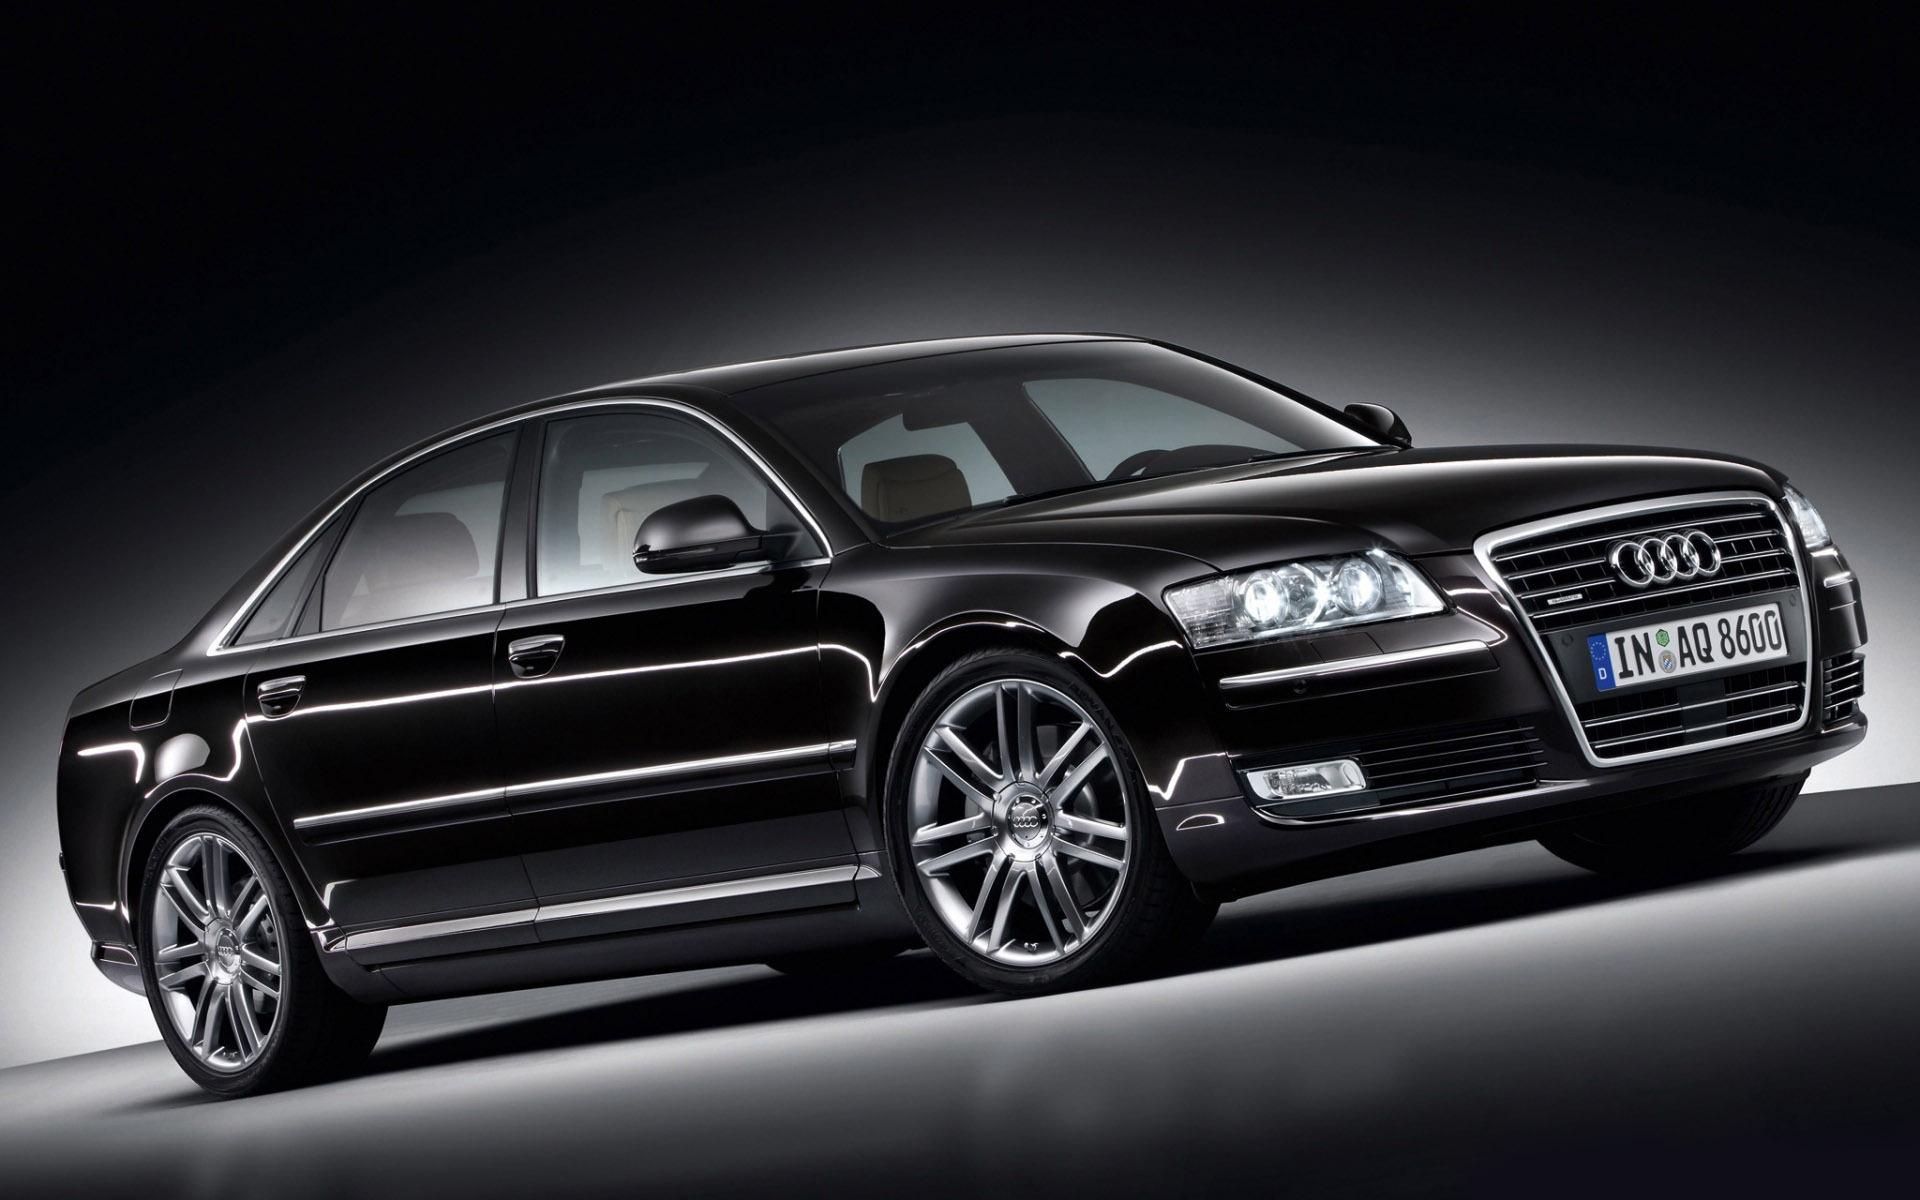 download Audi A8 wallpaper 10398 [1920x1200] for your Desktop 1920x1200